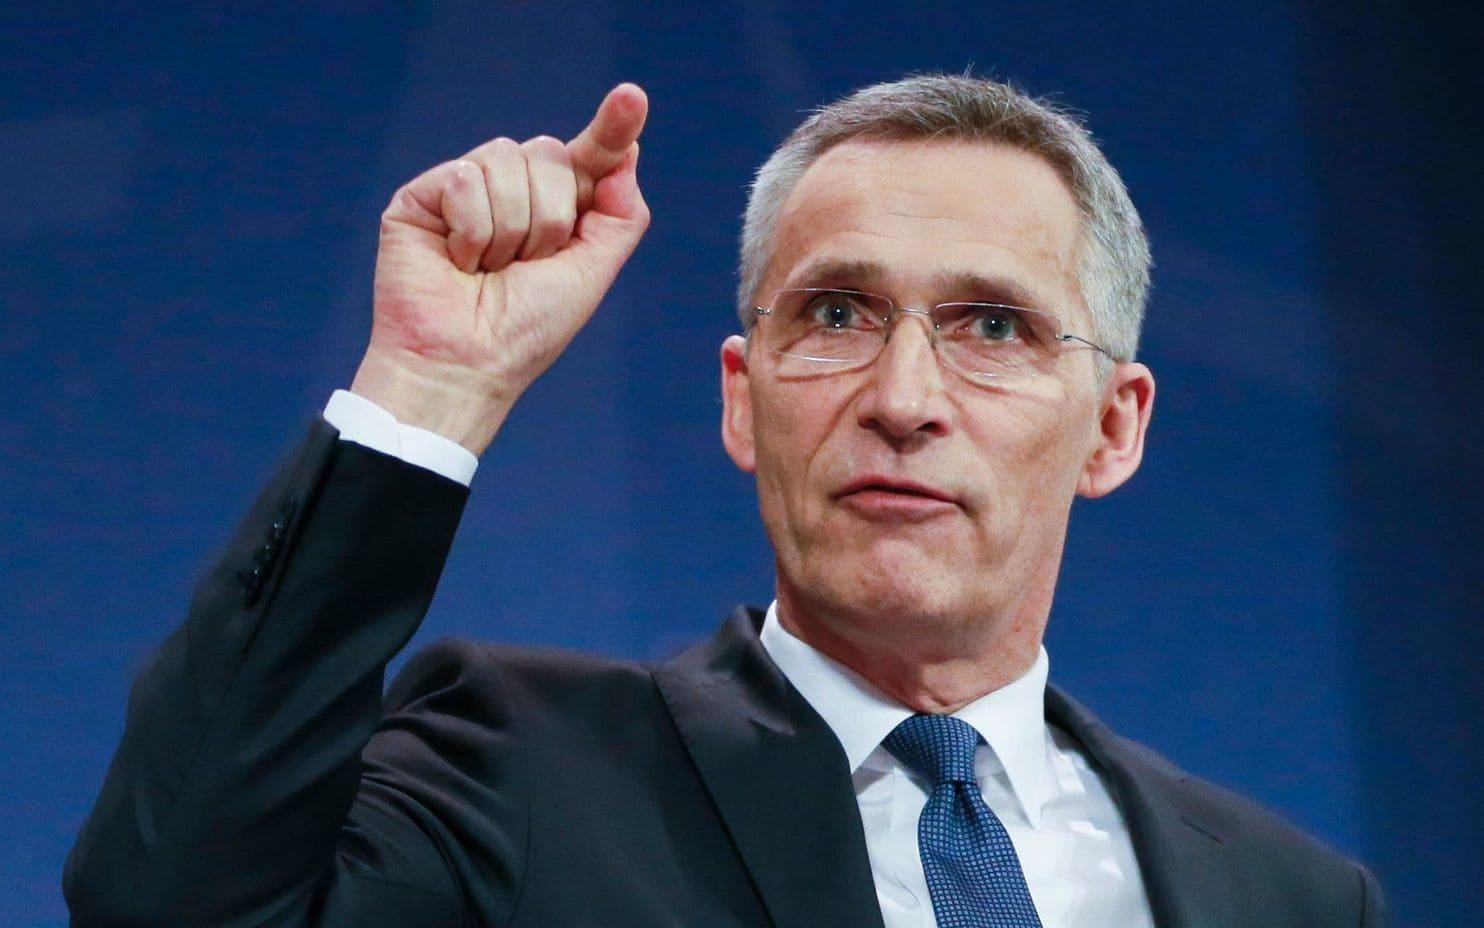 НАТО обвинило дипломатов РФ в «шпионаже»...